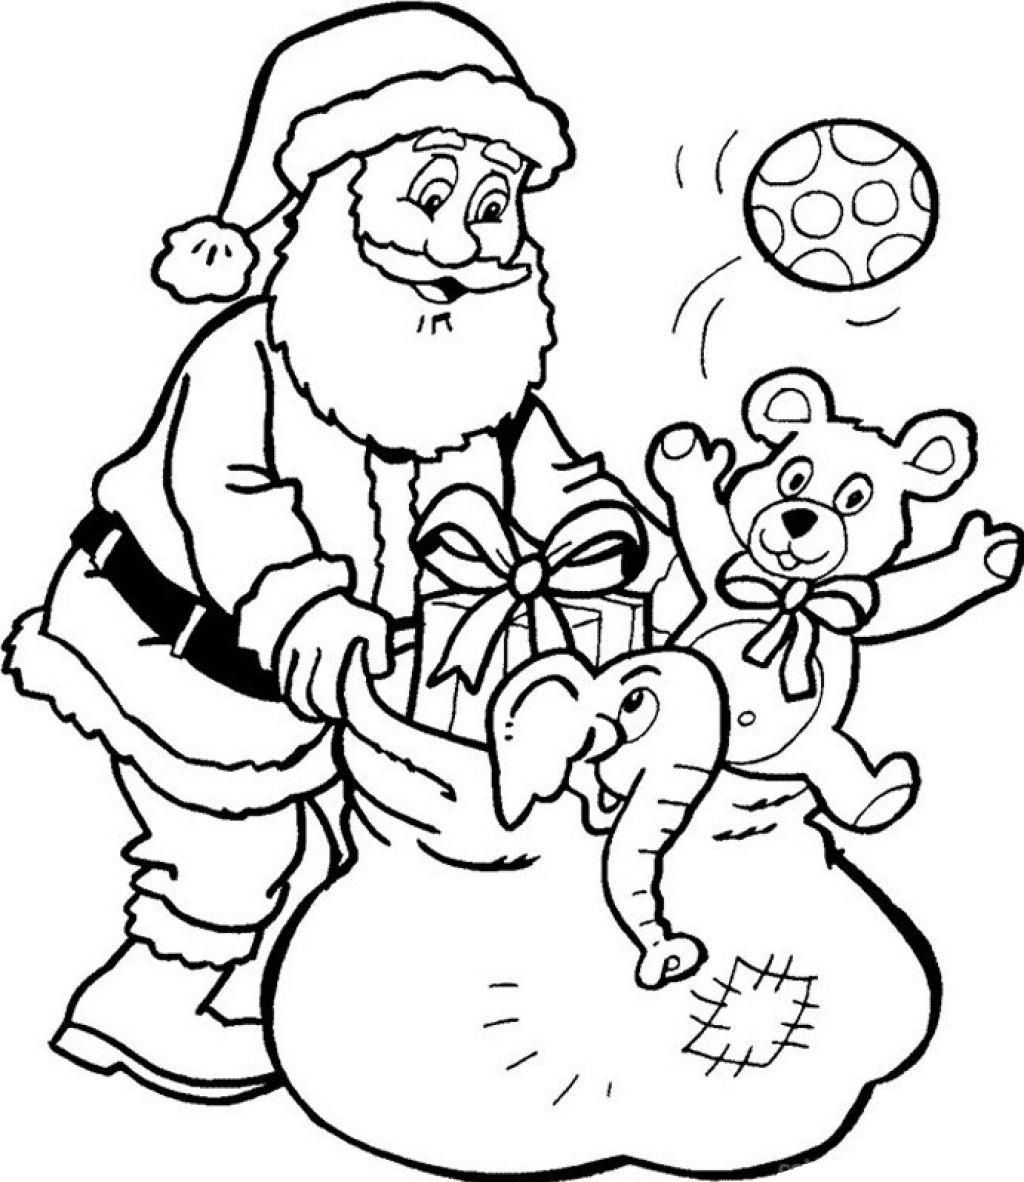 1024x1182 Printable Santa Claus Coloring Page Printable Santa Claus Coloring